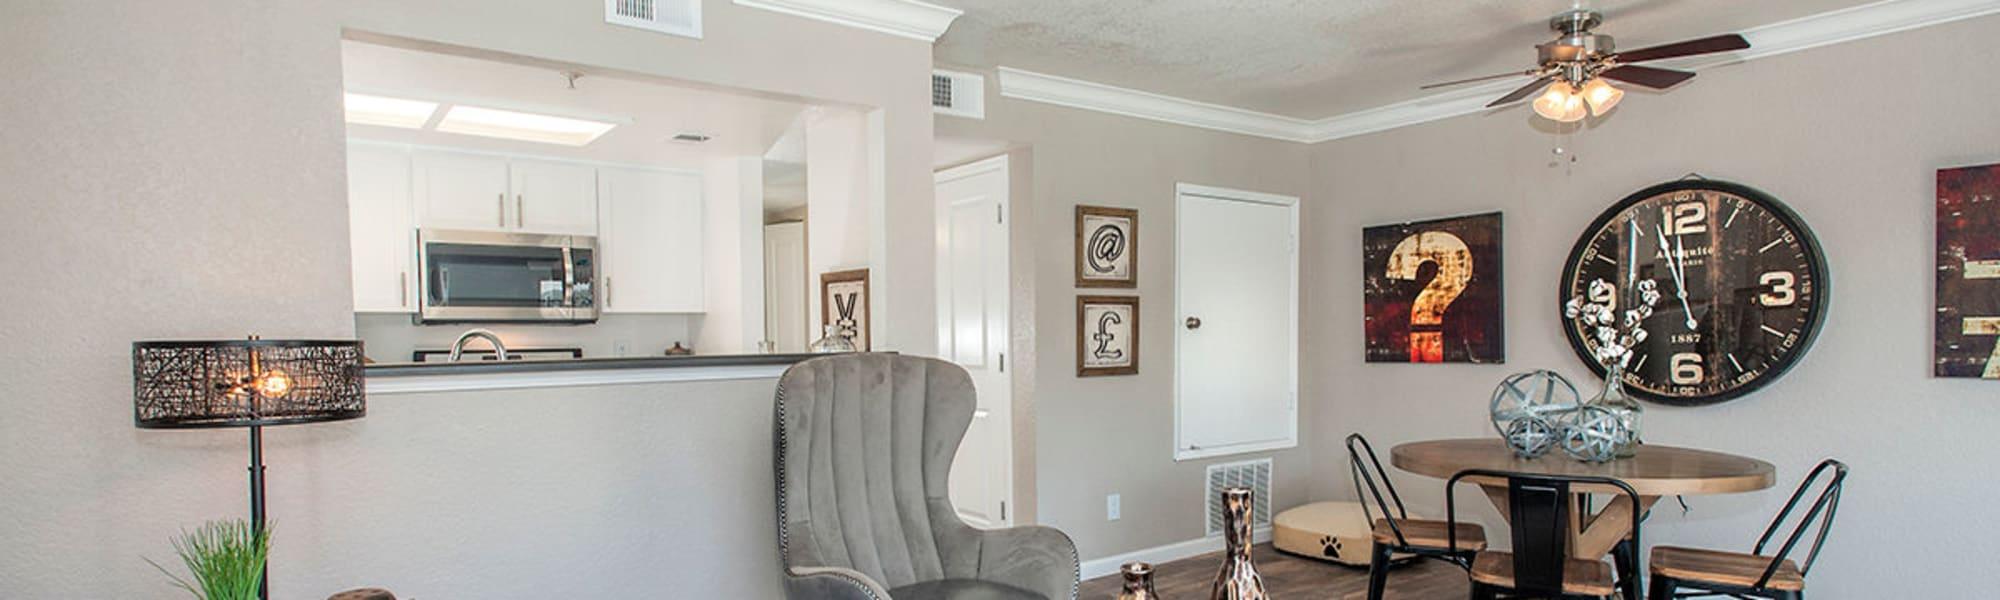 Floor plans at Sandpiper Village Apartment Homes in Vacaville, California